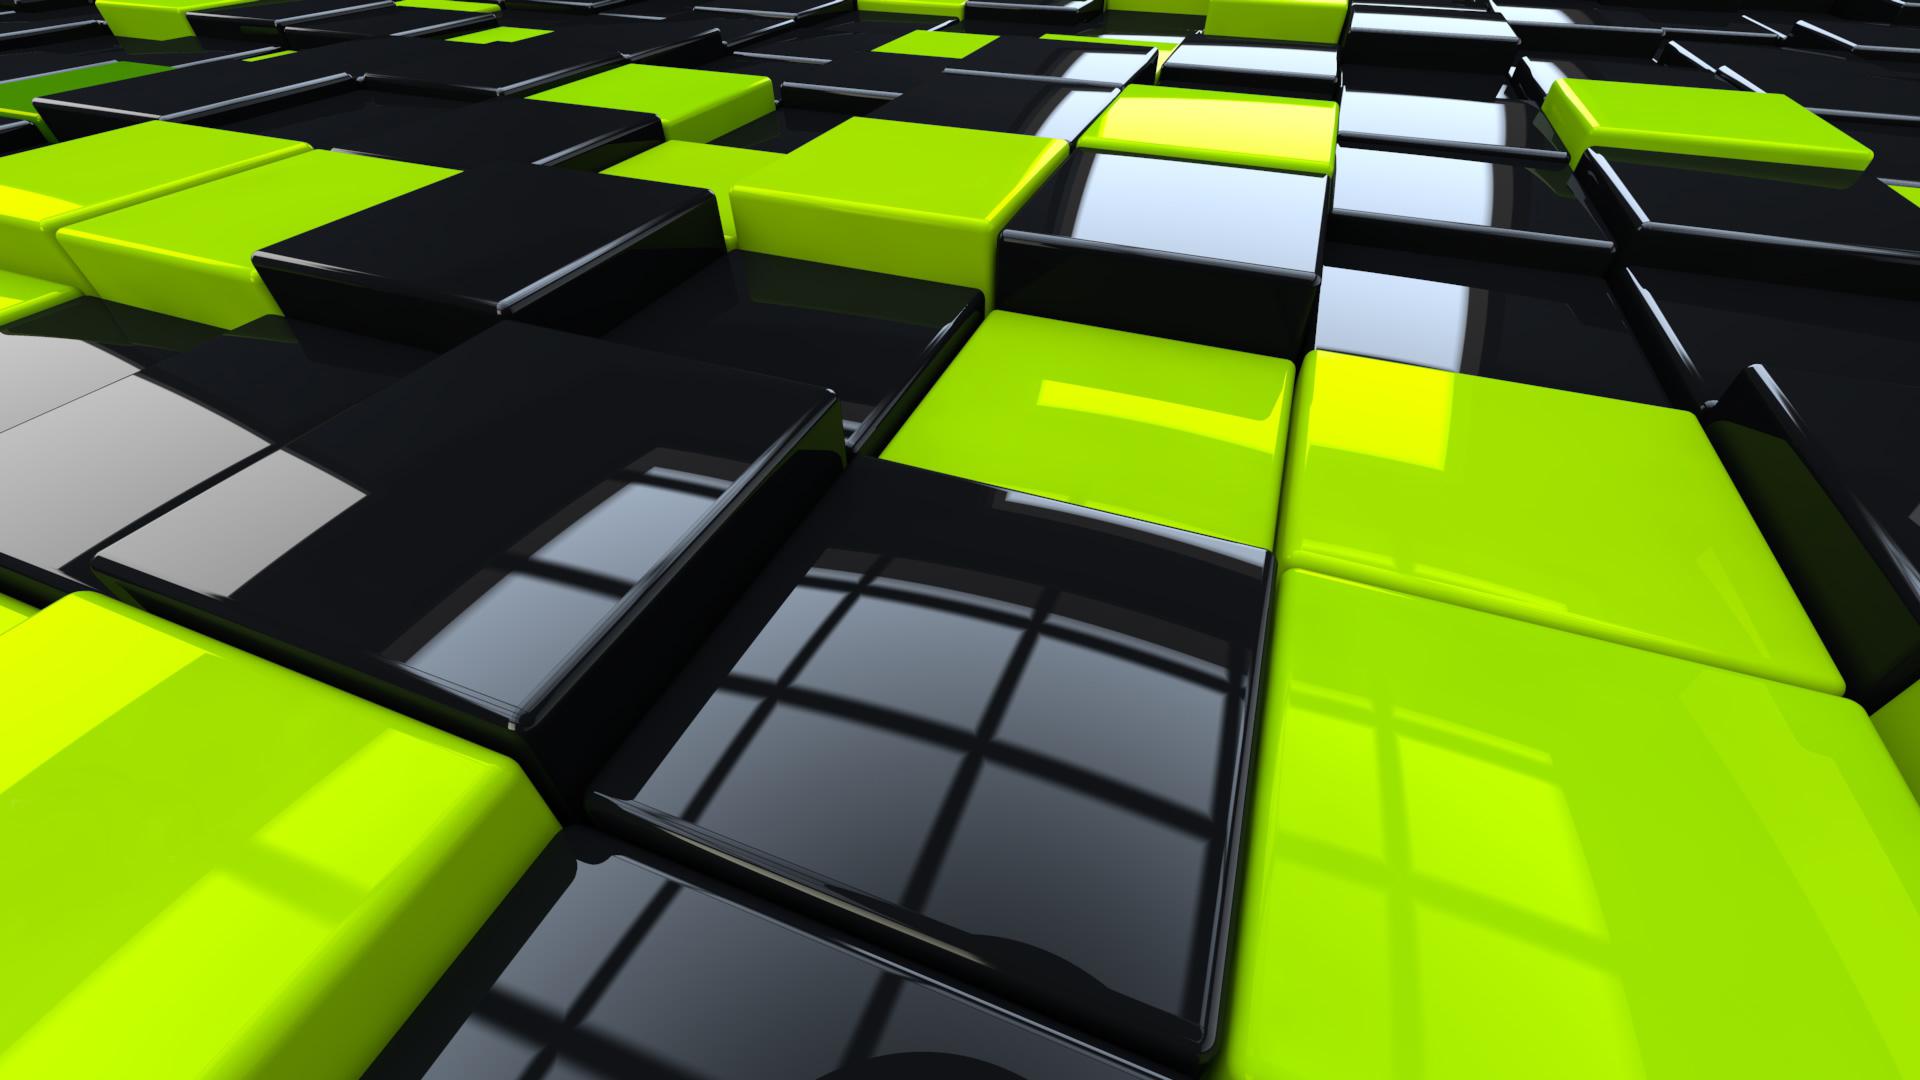 17 3d floor tile designs ideas design trends premium psd 3d cube floor design dailygadgetfo Choice Image